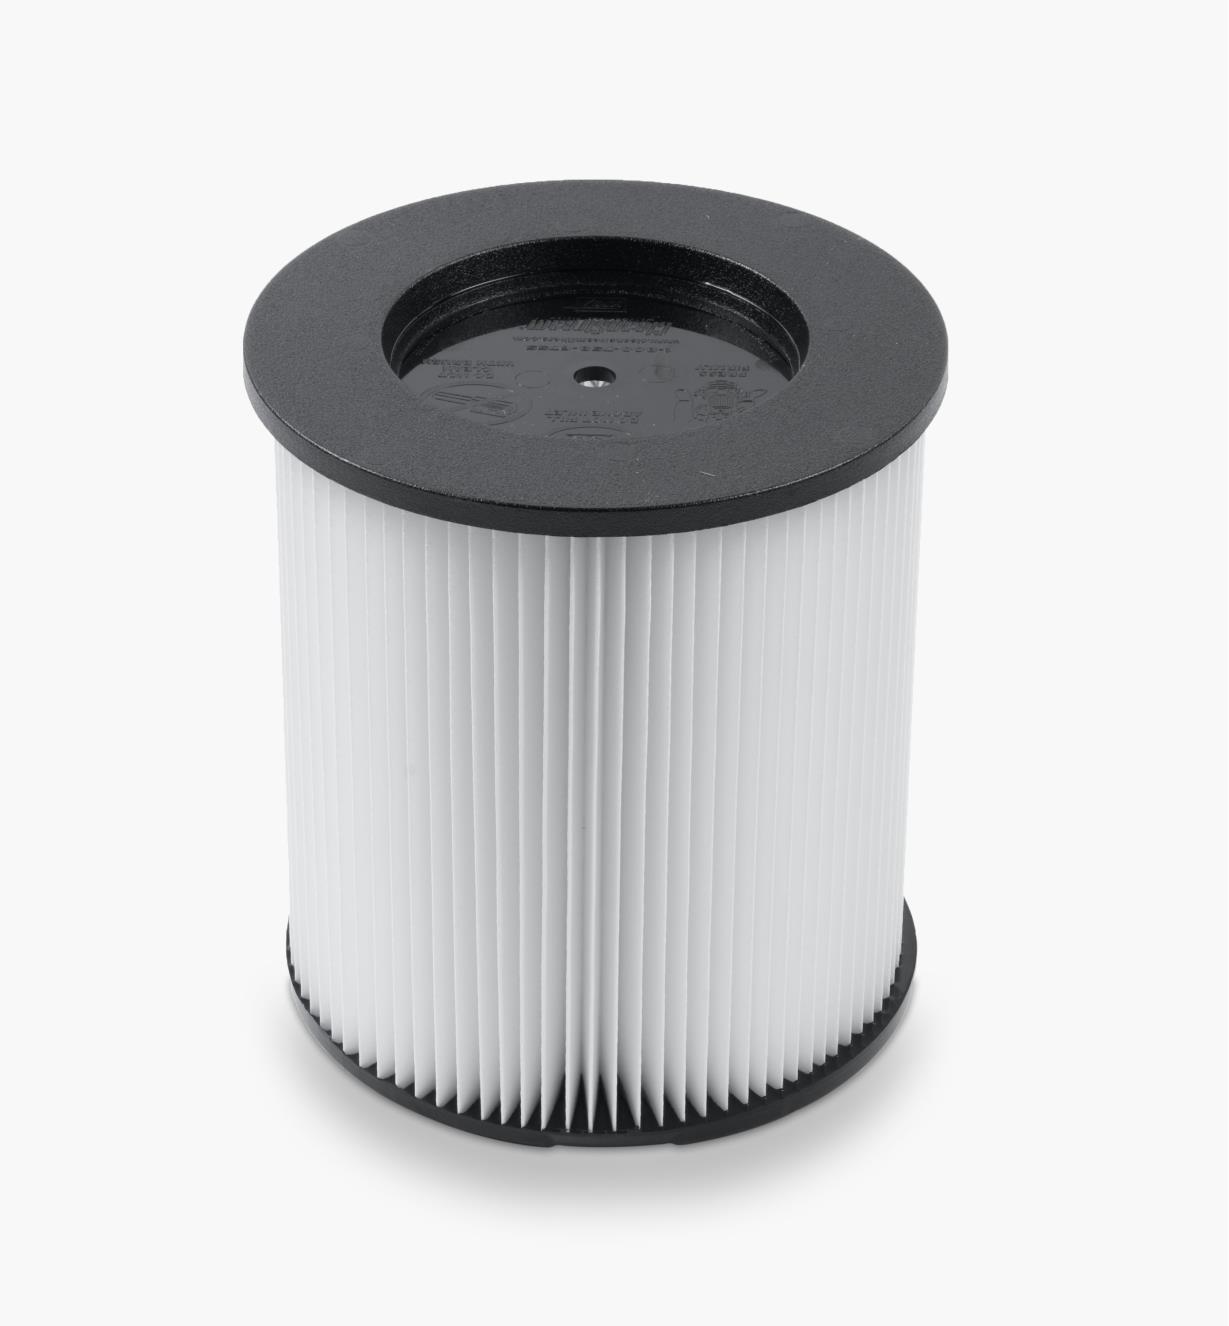 03J2417 - Ridgid/Craftsman HEPA Filter